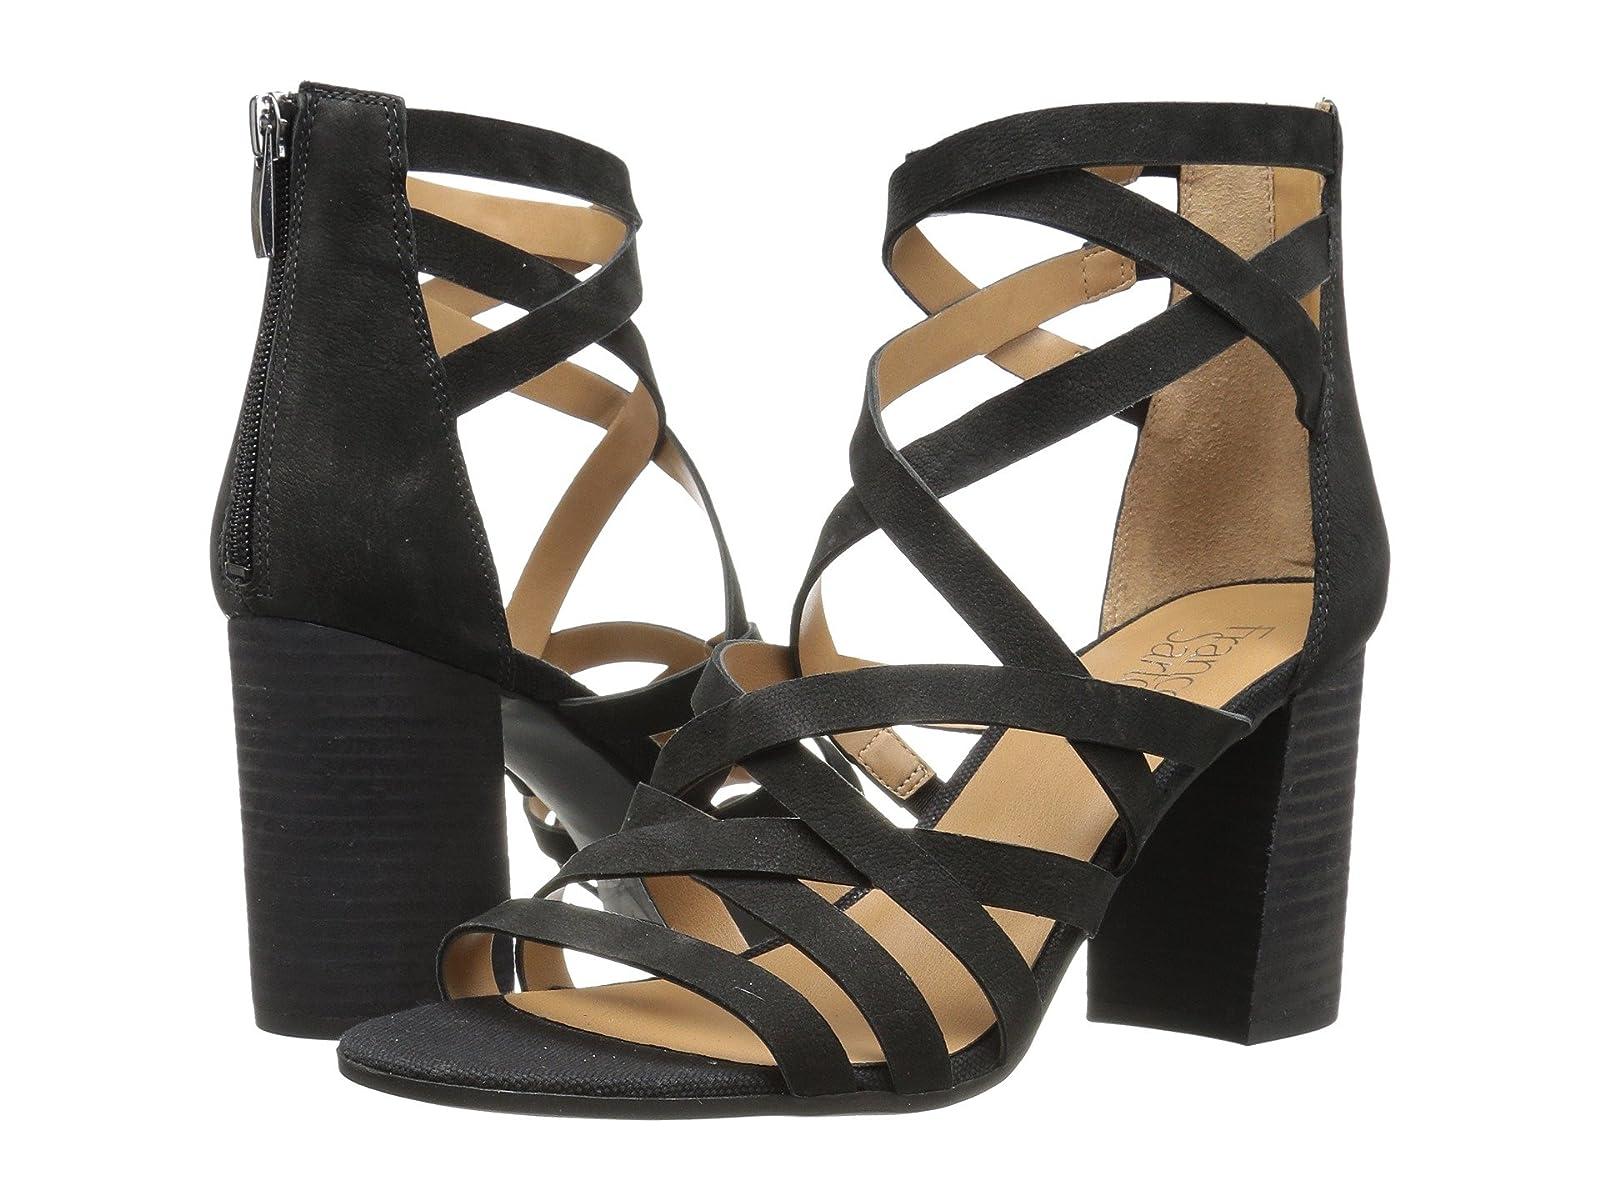 Franco Sarto MadridCheap and distinctive eye-catching shoes